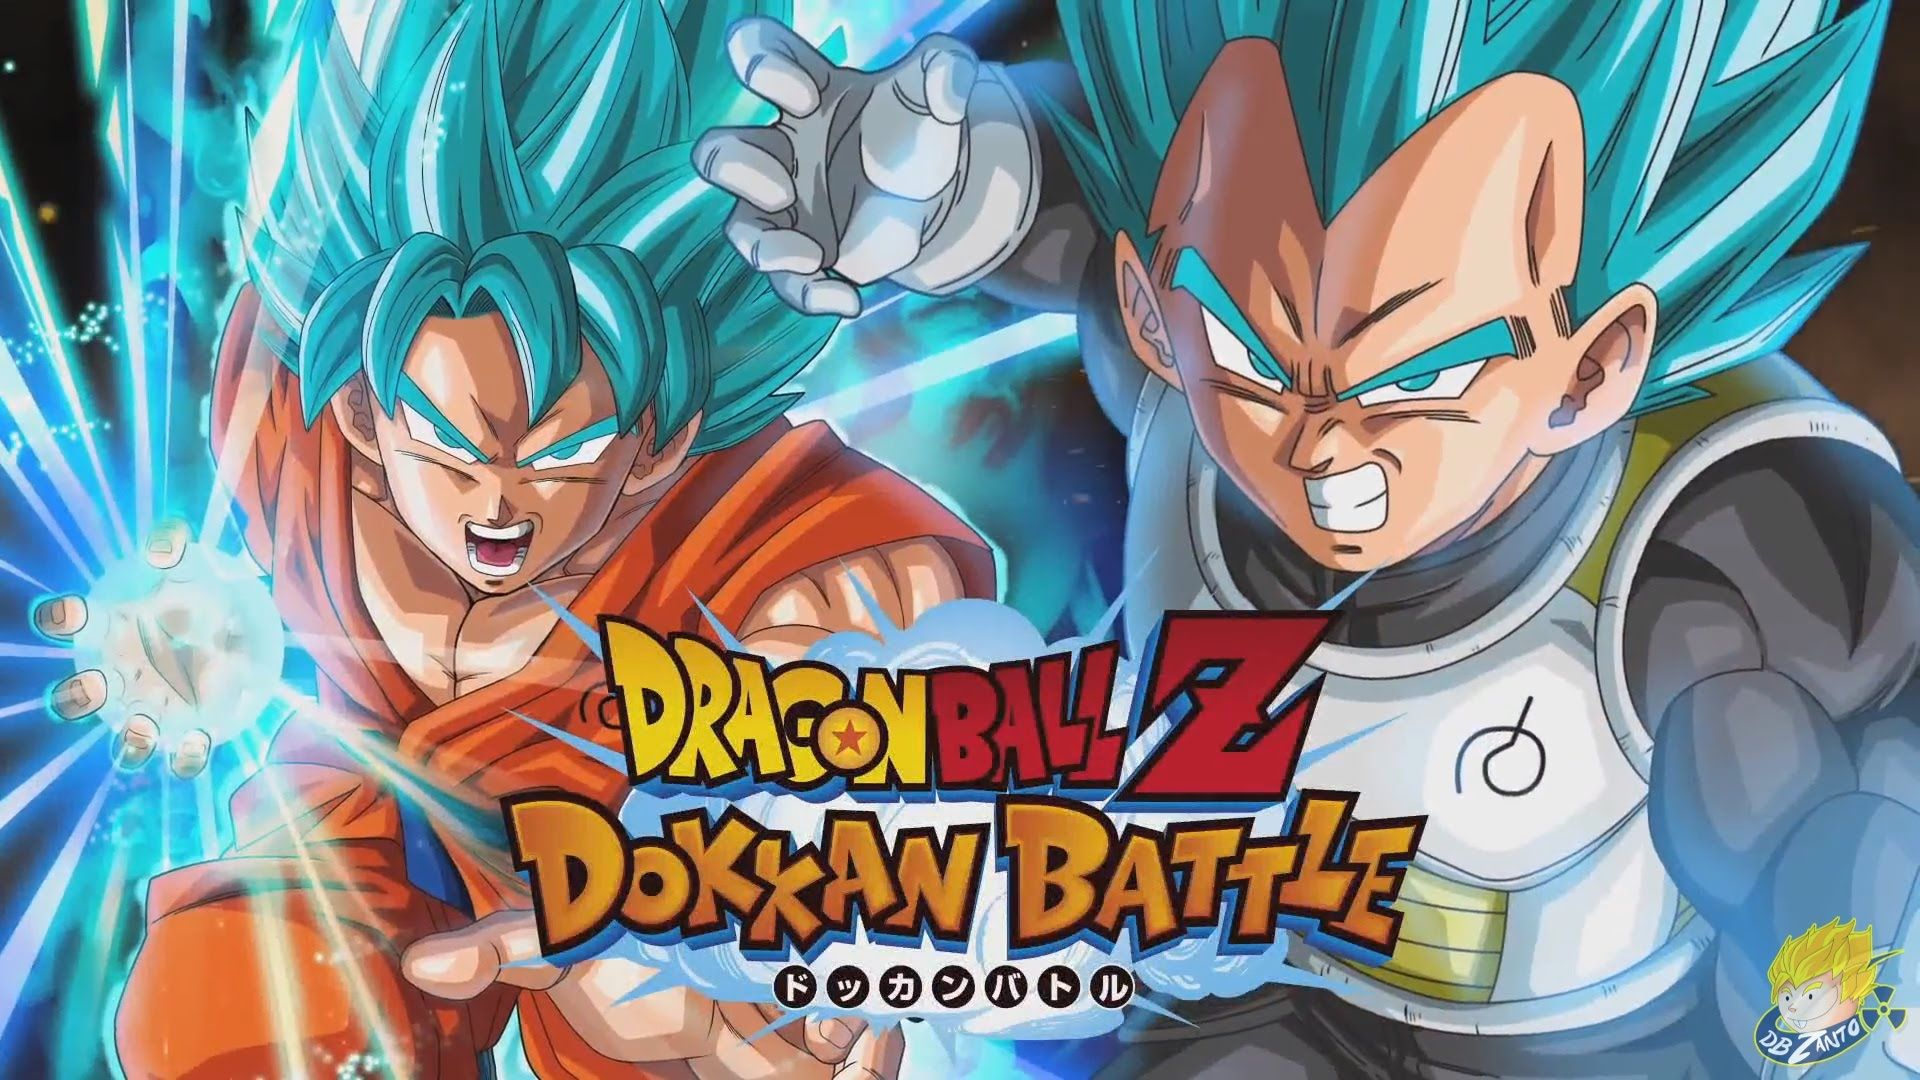 Dragon Ball Z Dokkan Battle Hack Add Unlimited Zeni And Dragon